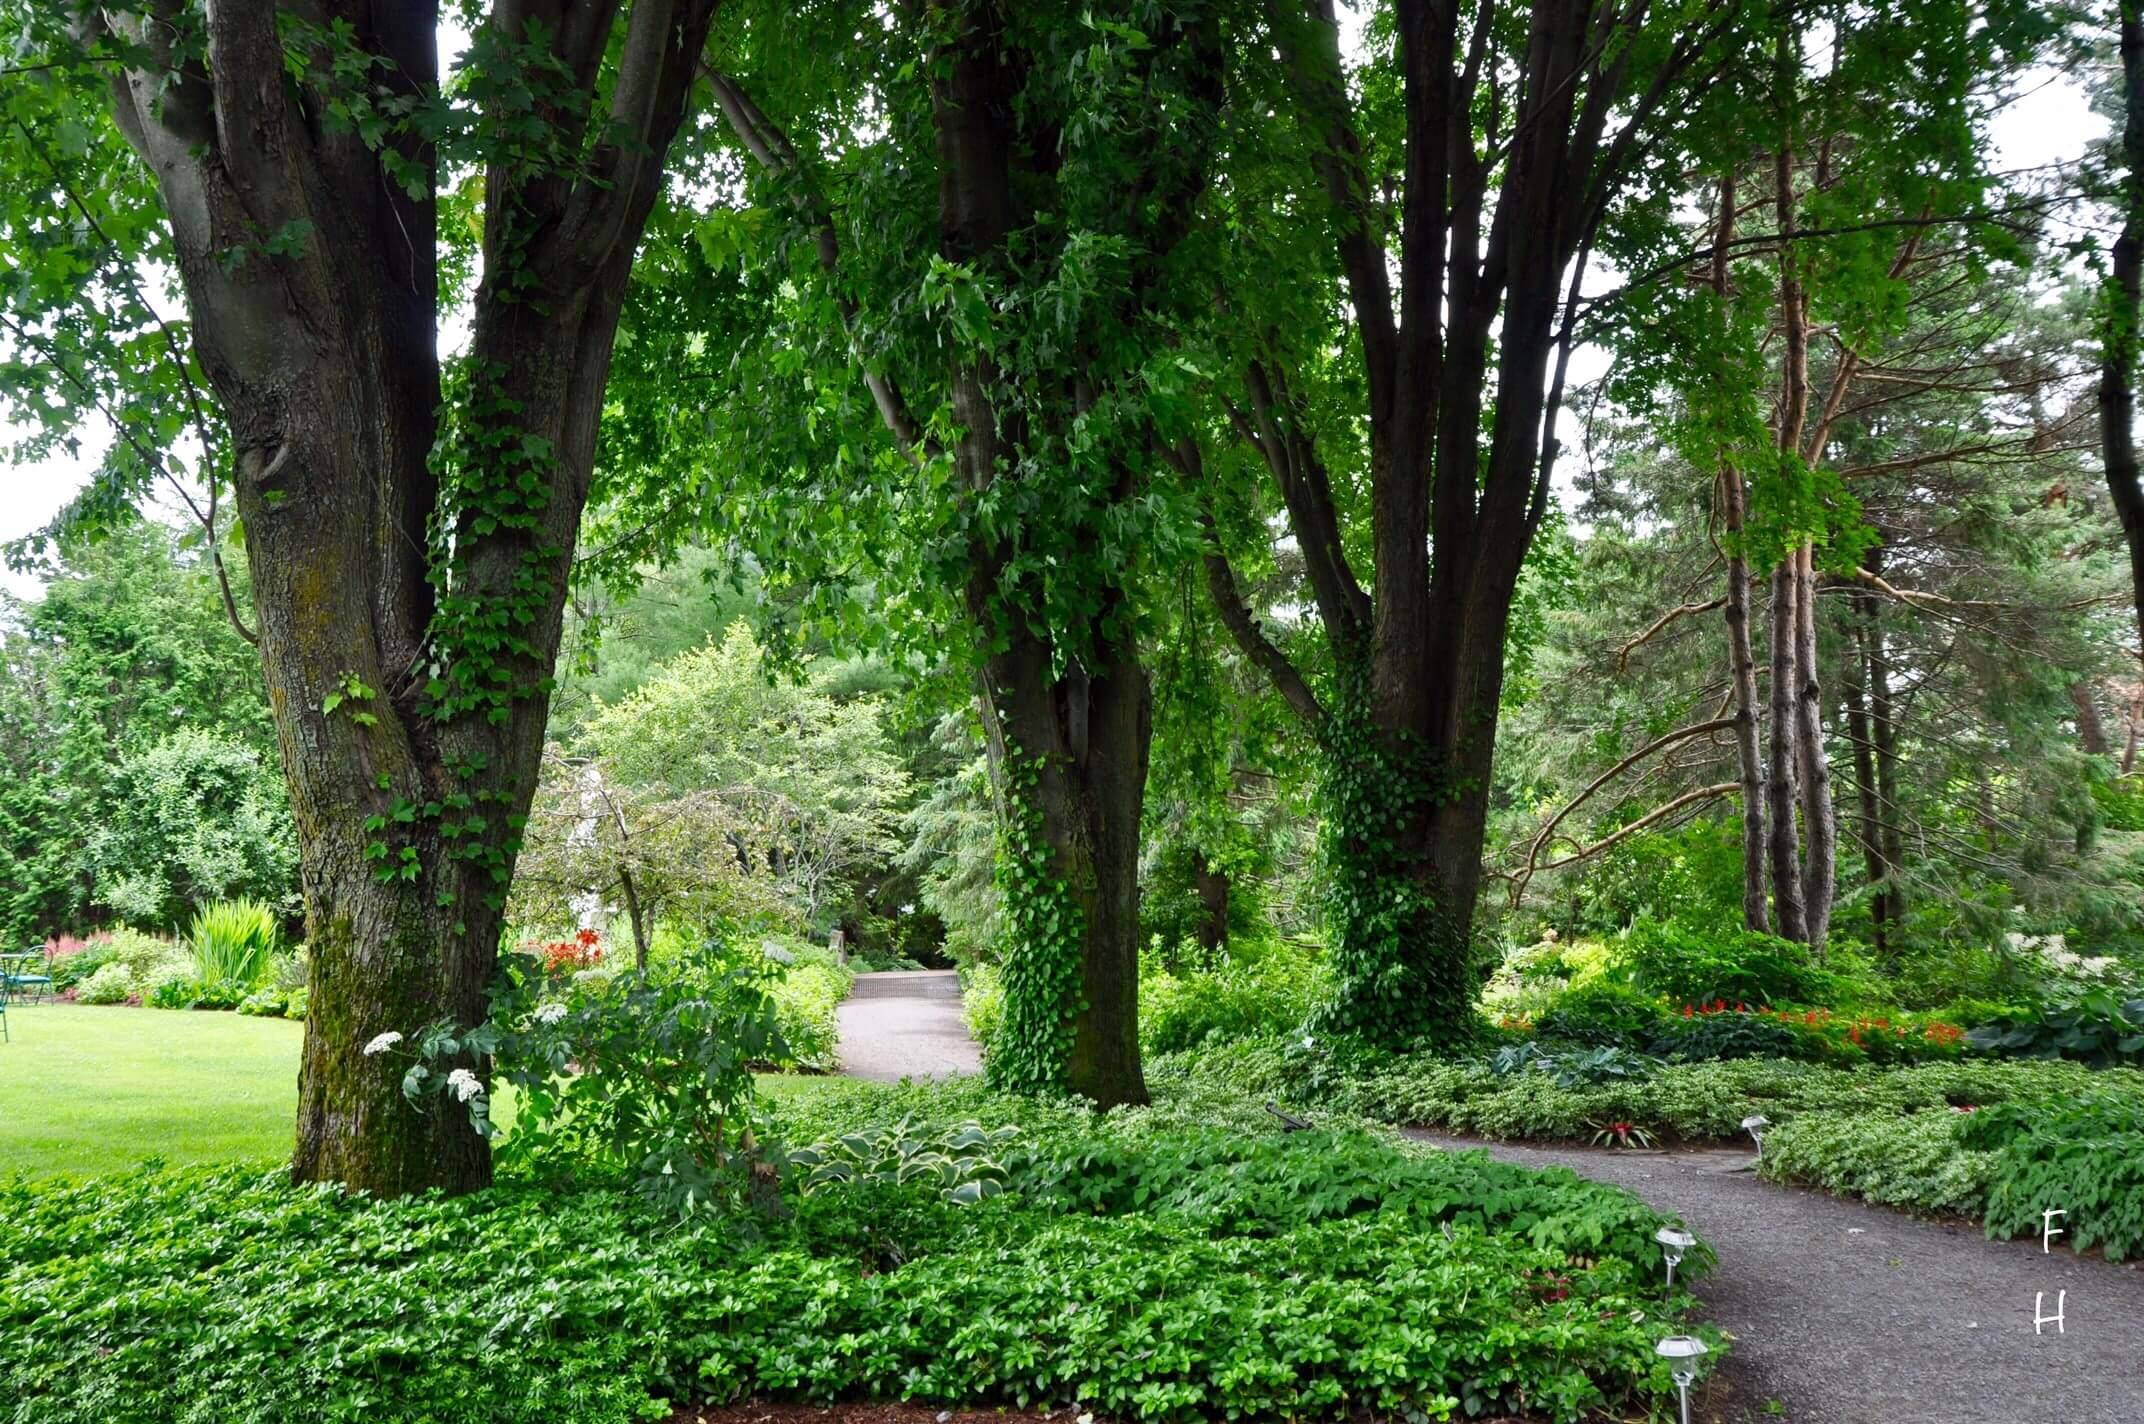 Sentier du jardin anglais